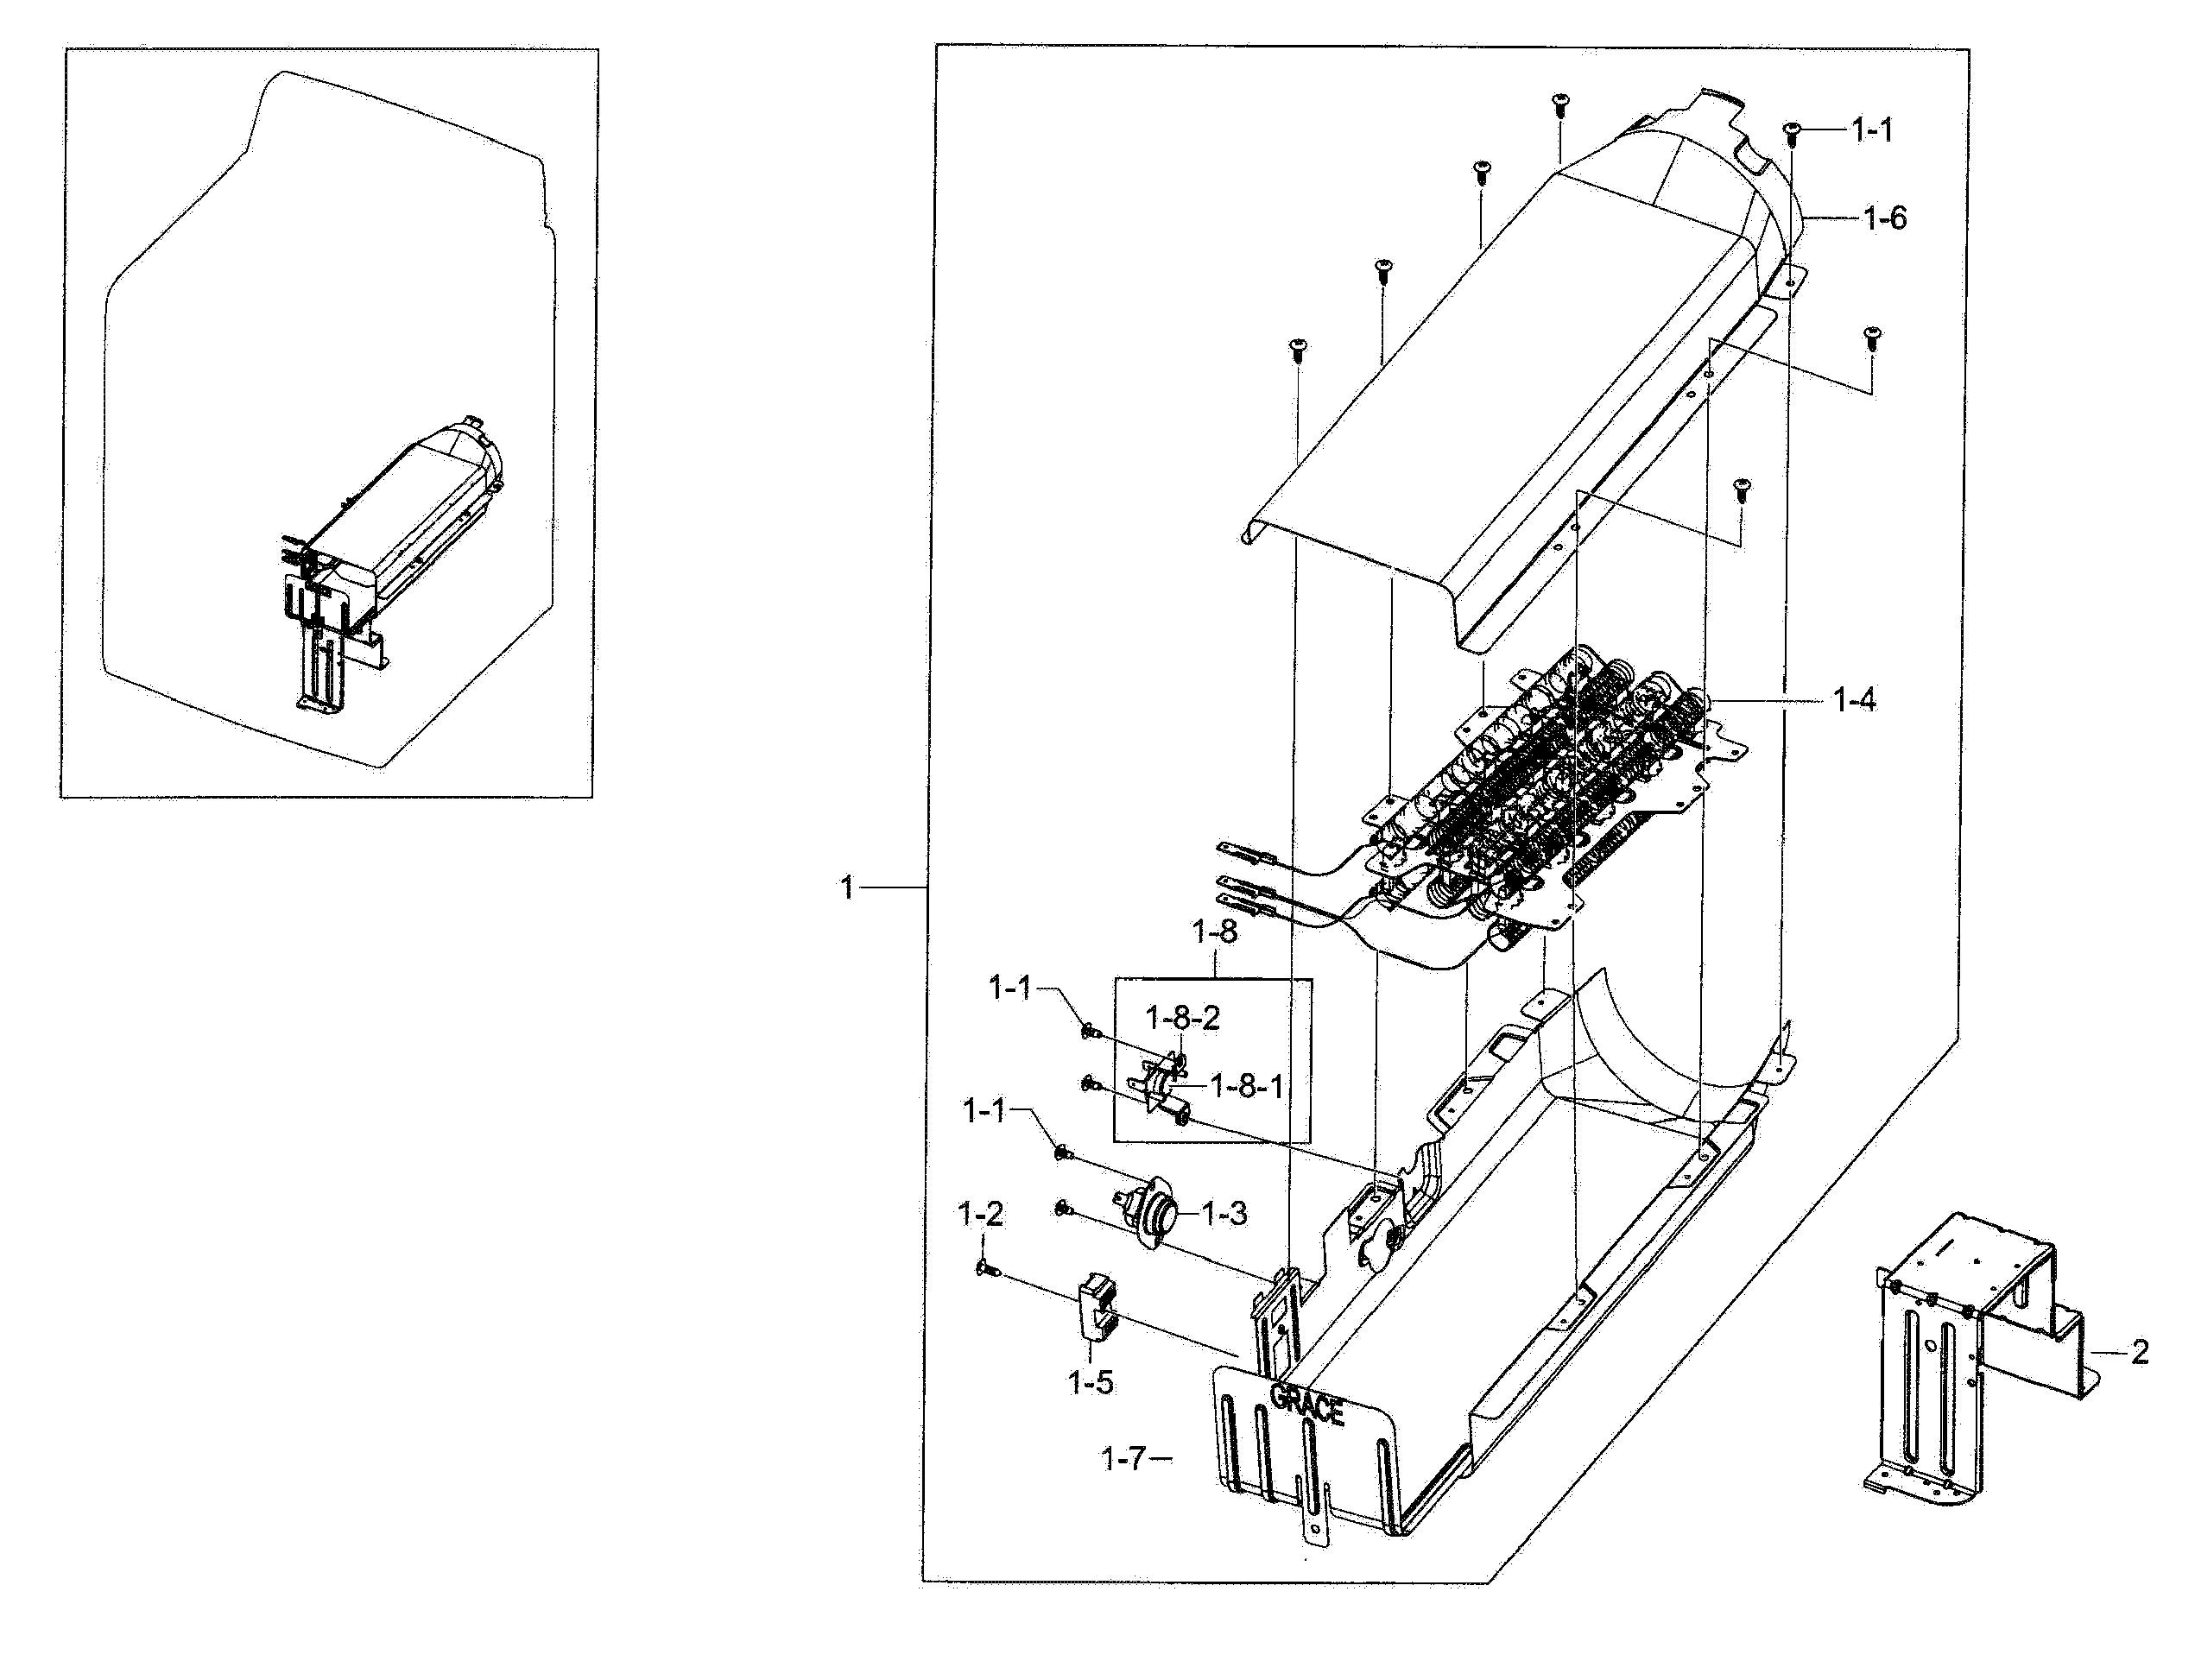 Dyson Animal Parts Diagram Samsung Model Dv56h9100eg A2 0000 Residential Dryer Genuine Parts Of Dyson Animal Parts Diagram